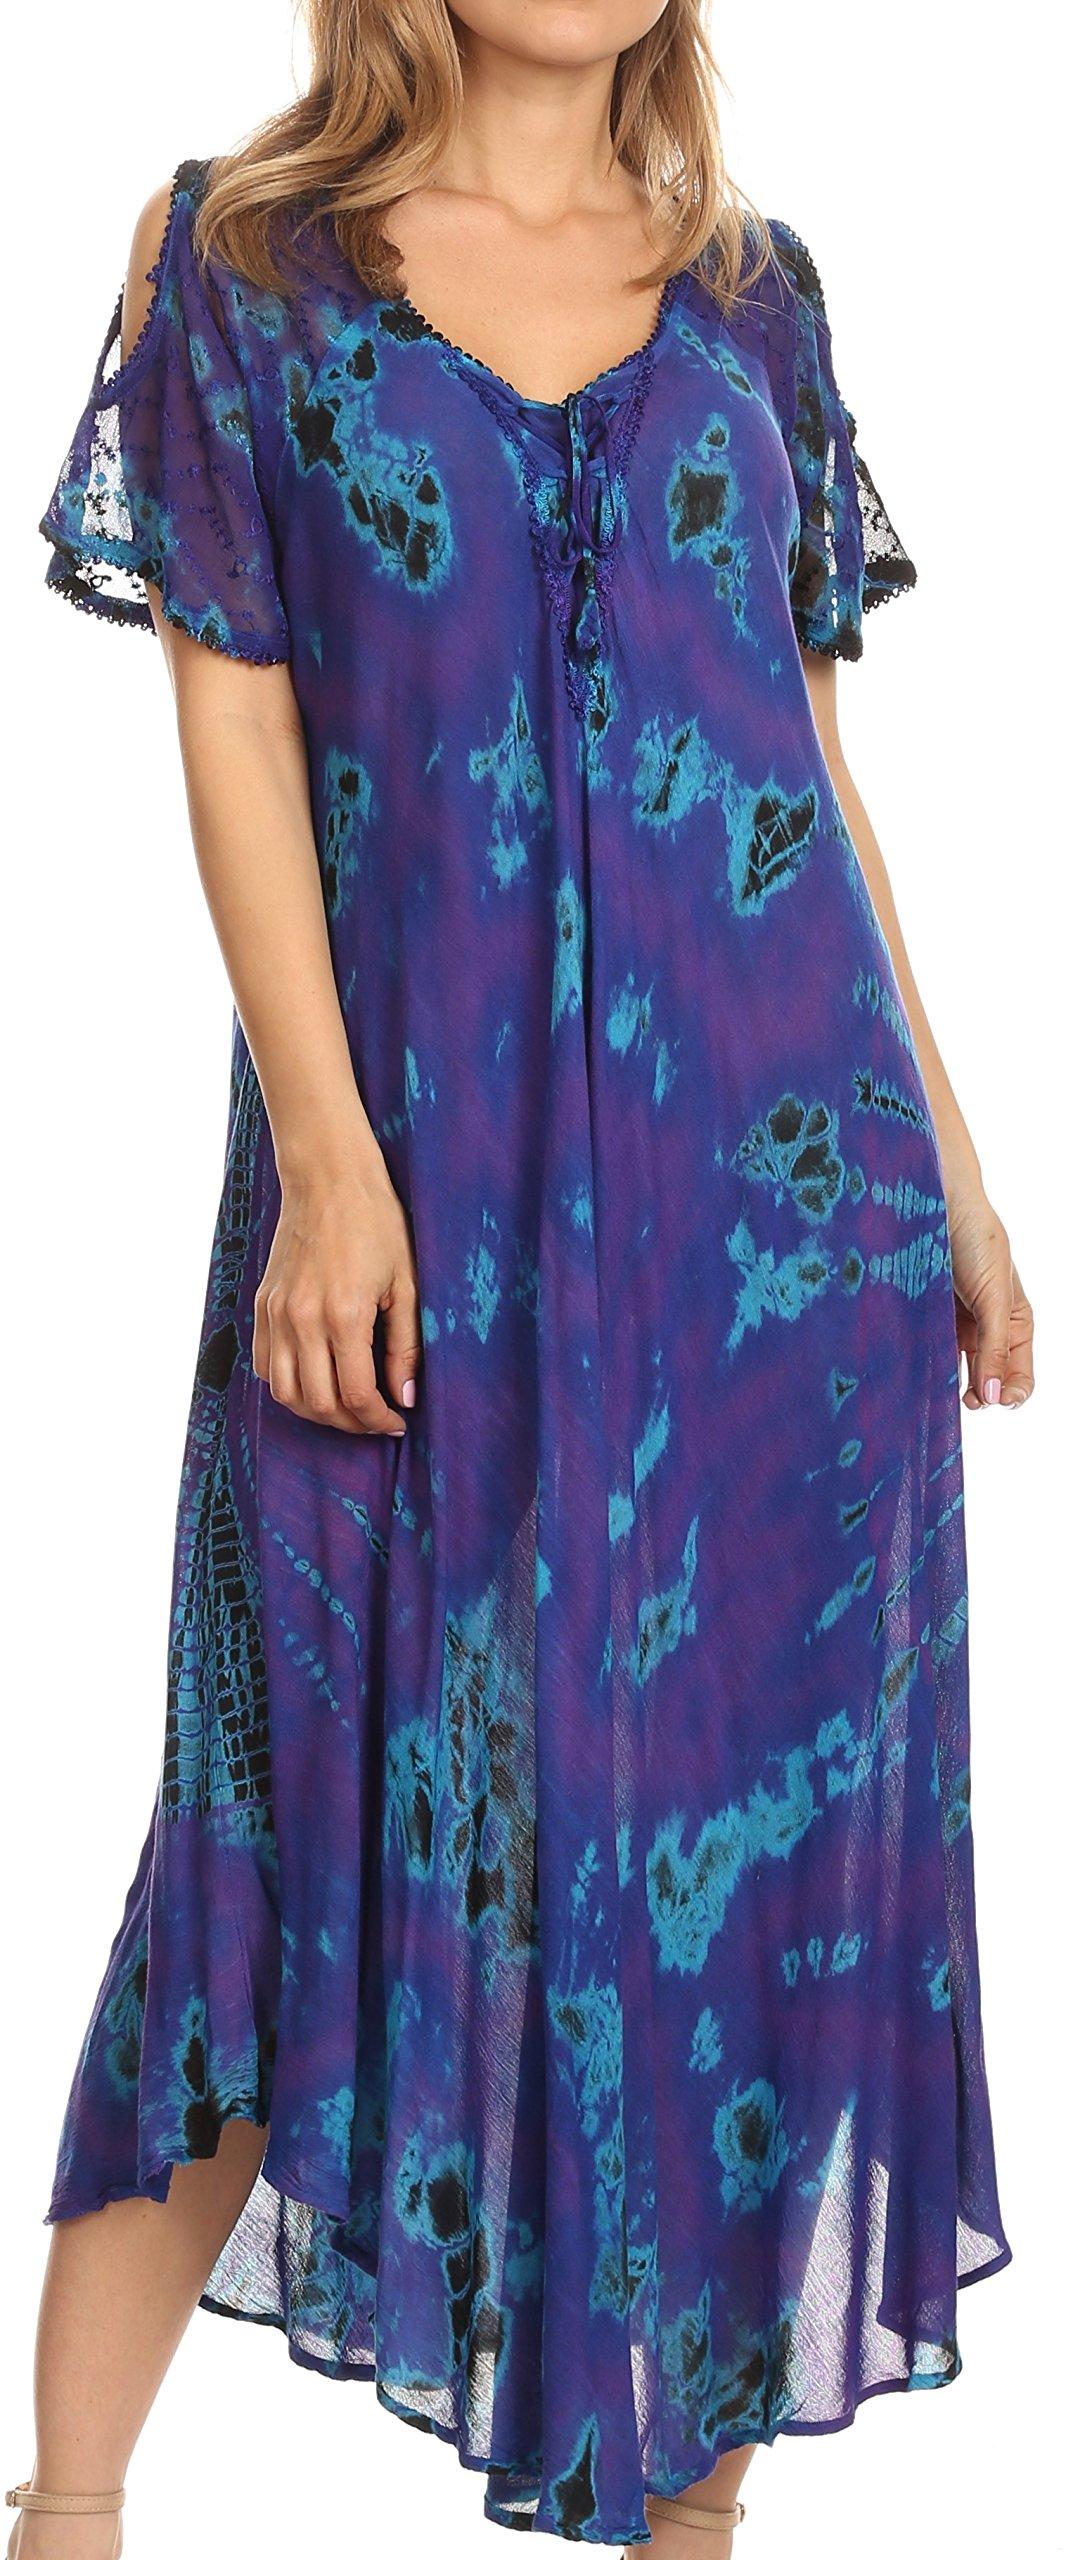 Sakkas 18682 - Ada Women Cold Shoulder Caftan Relax Long Maxi Dress on Tie-dye with Corset - Purple - OS